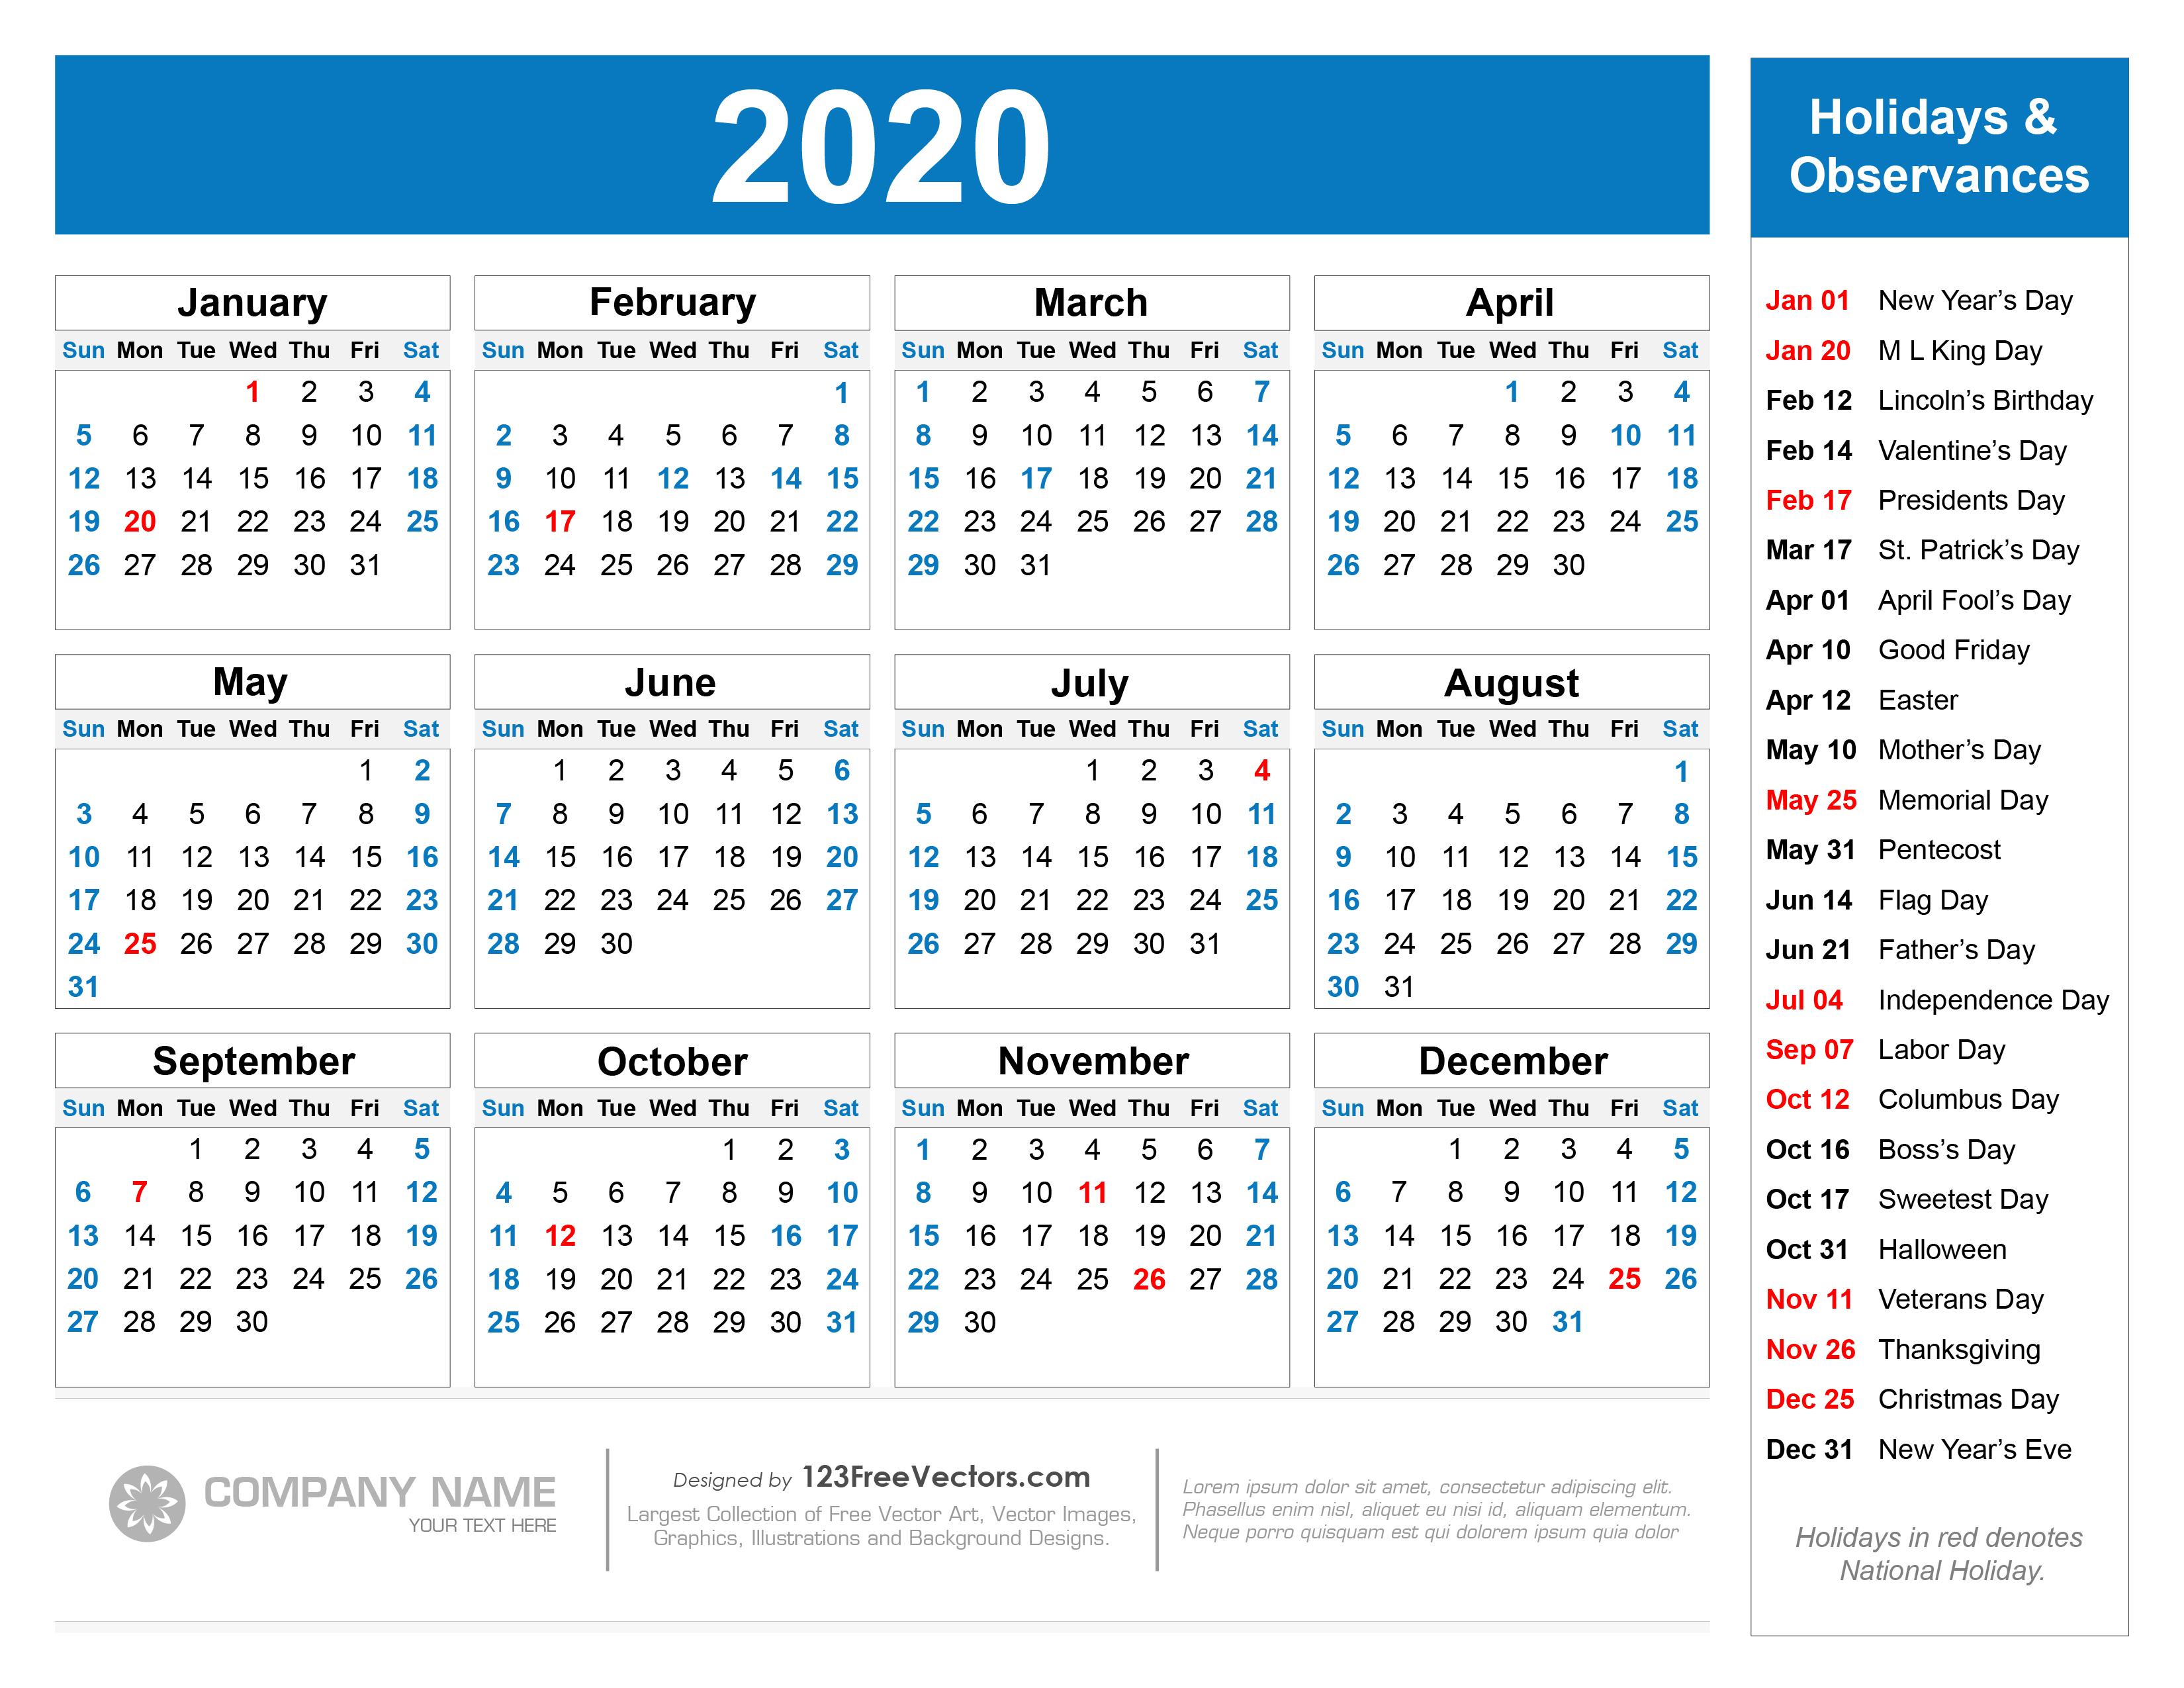 Free 2020 Printable Christmas Calendar 210+ 2020 Calendar Vectors | Download Free Vector Art & Graphics